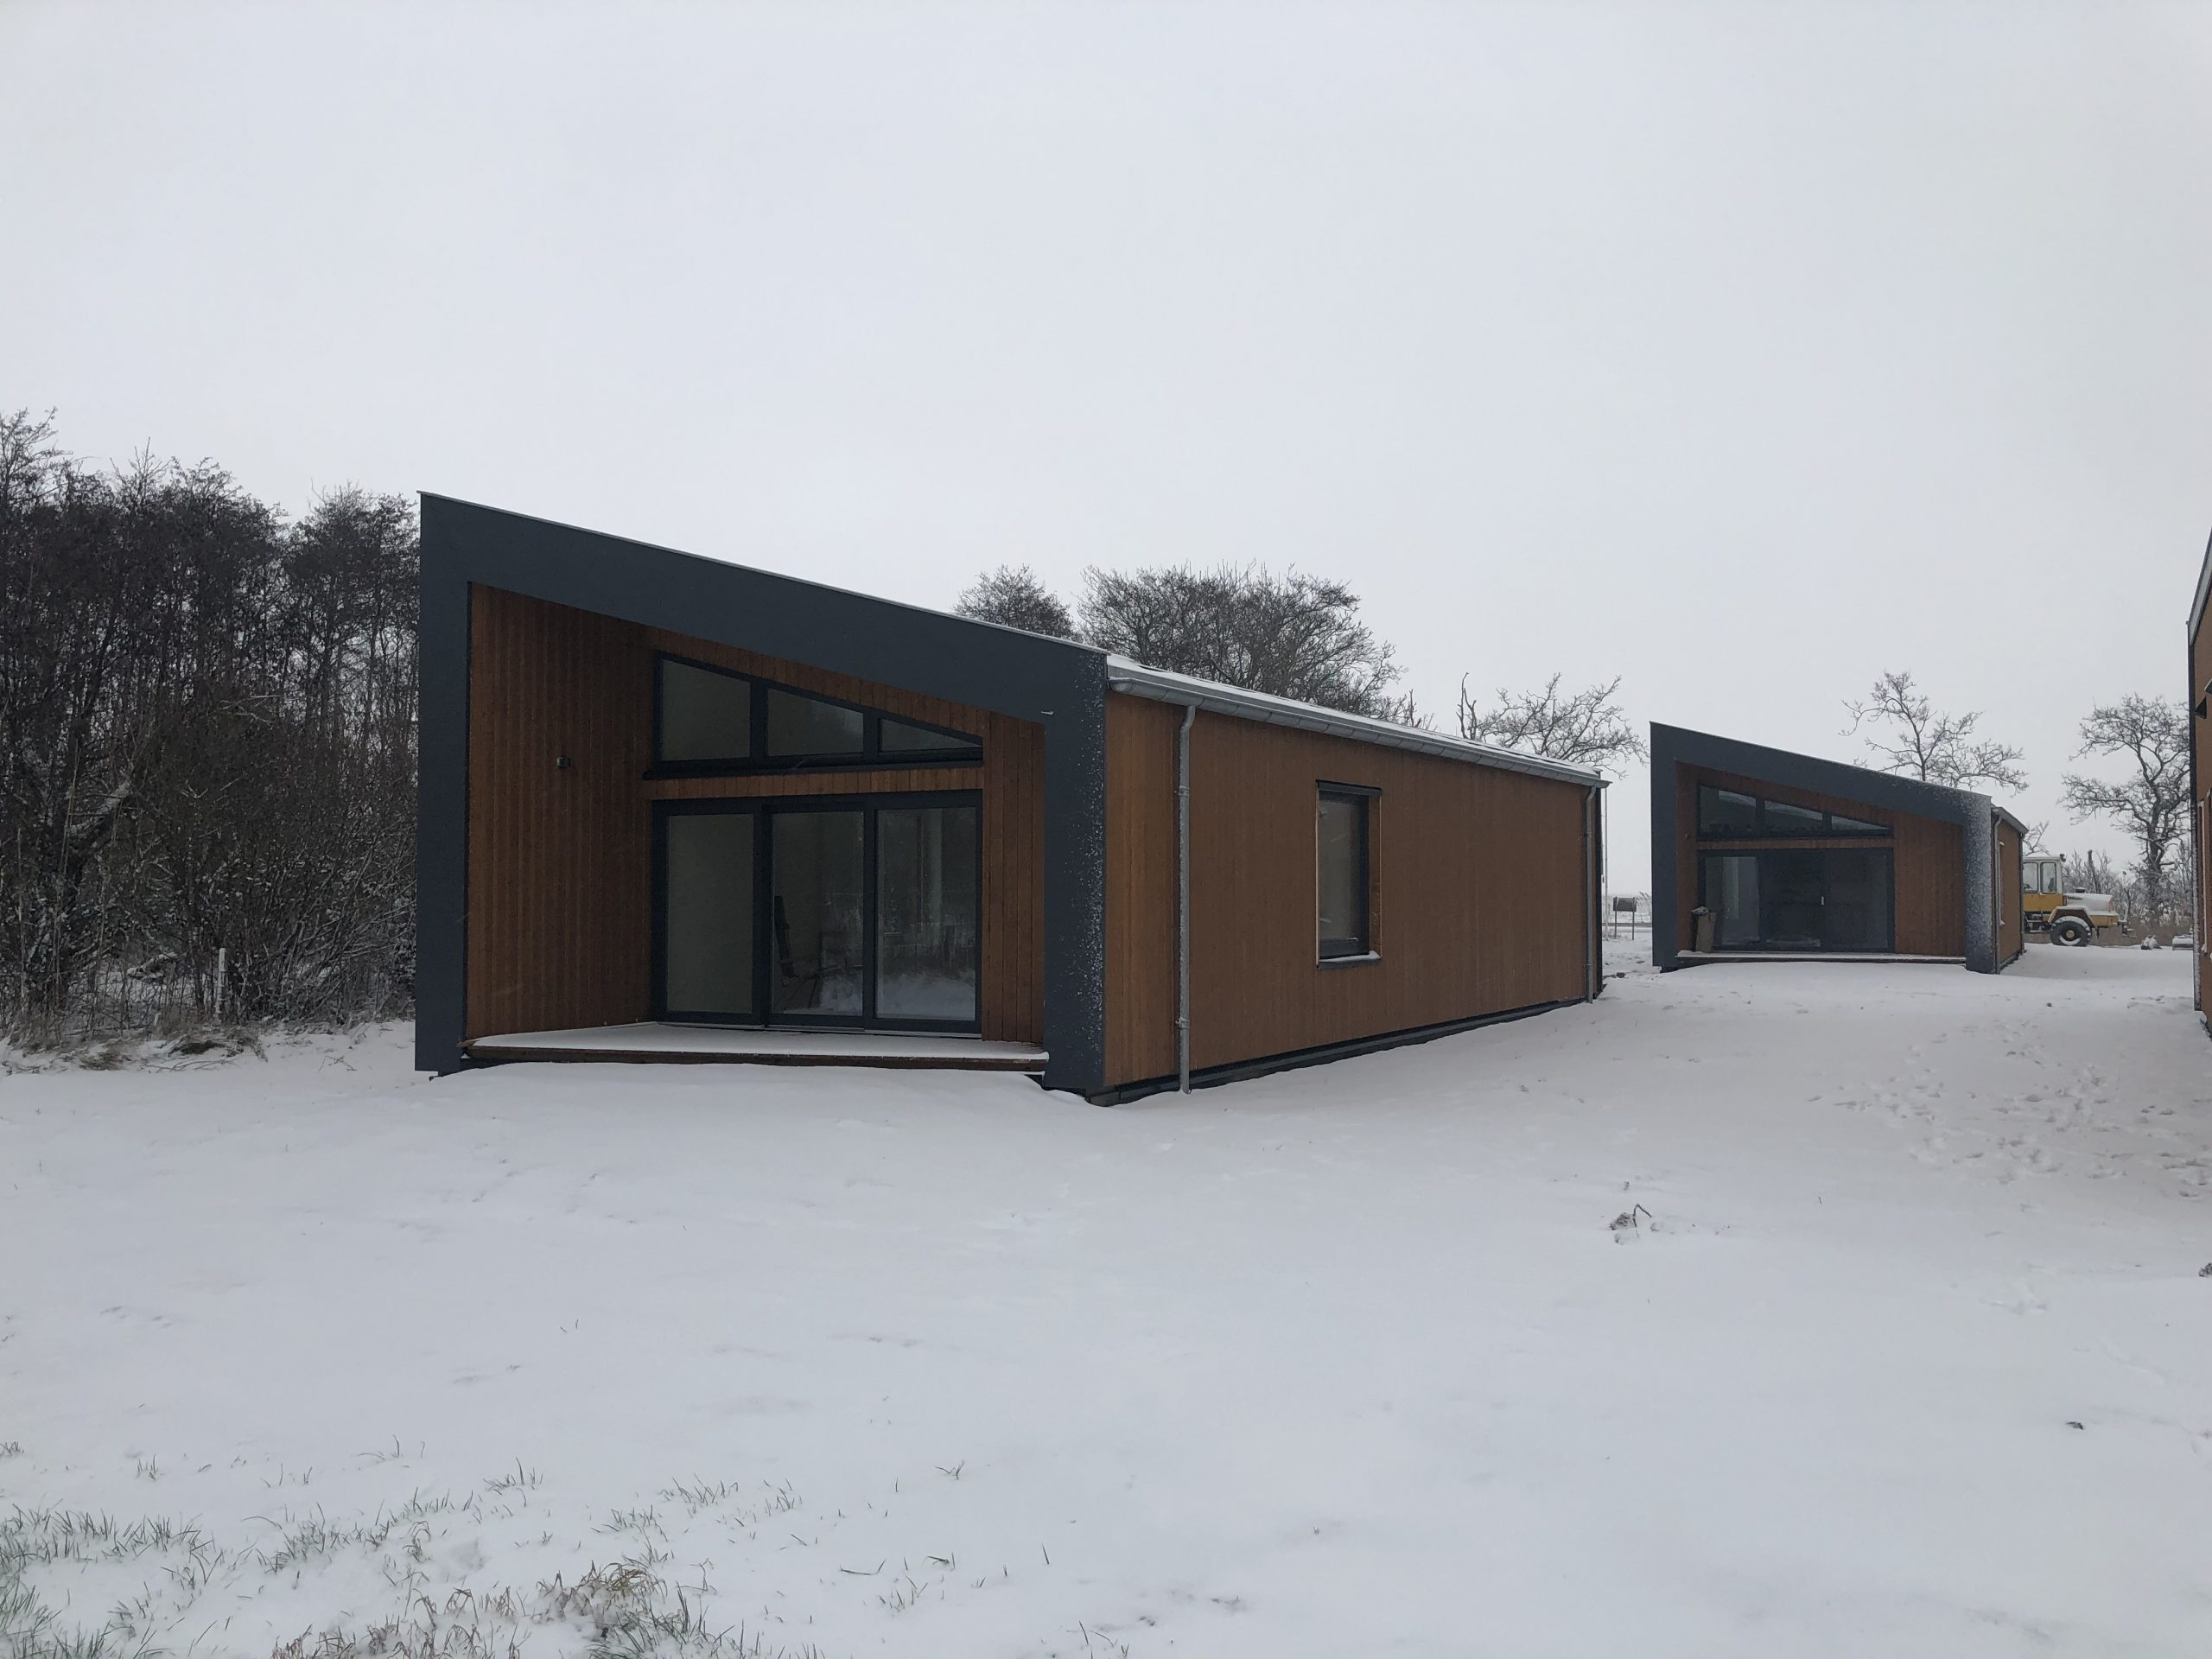 Regular housing